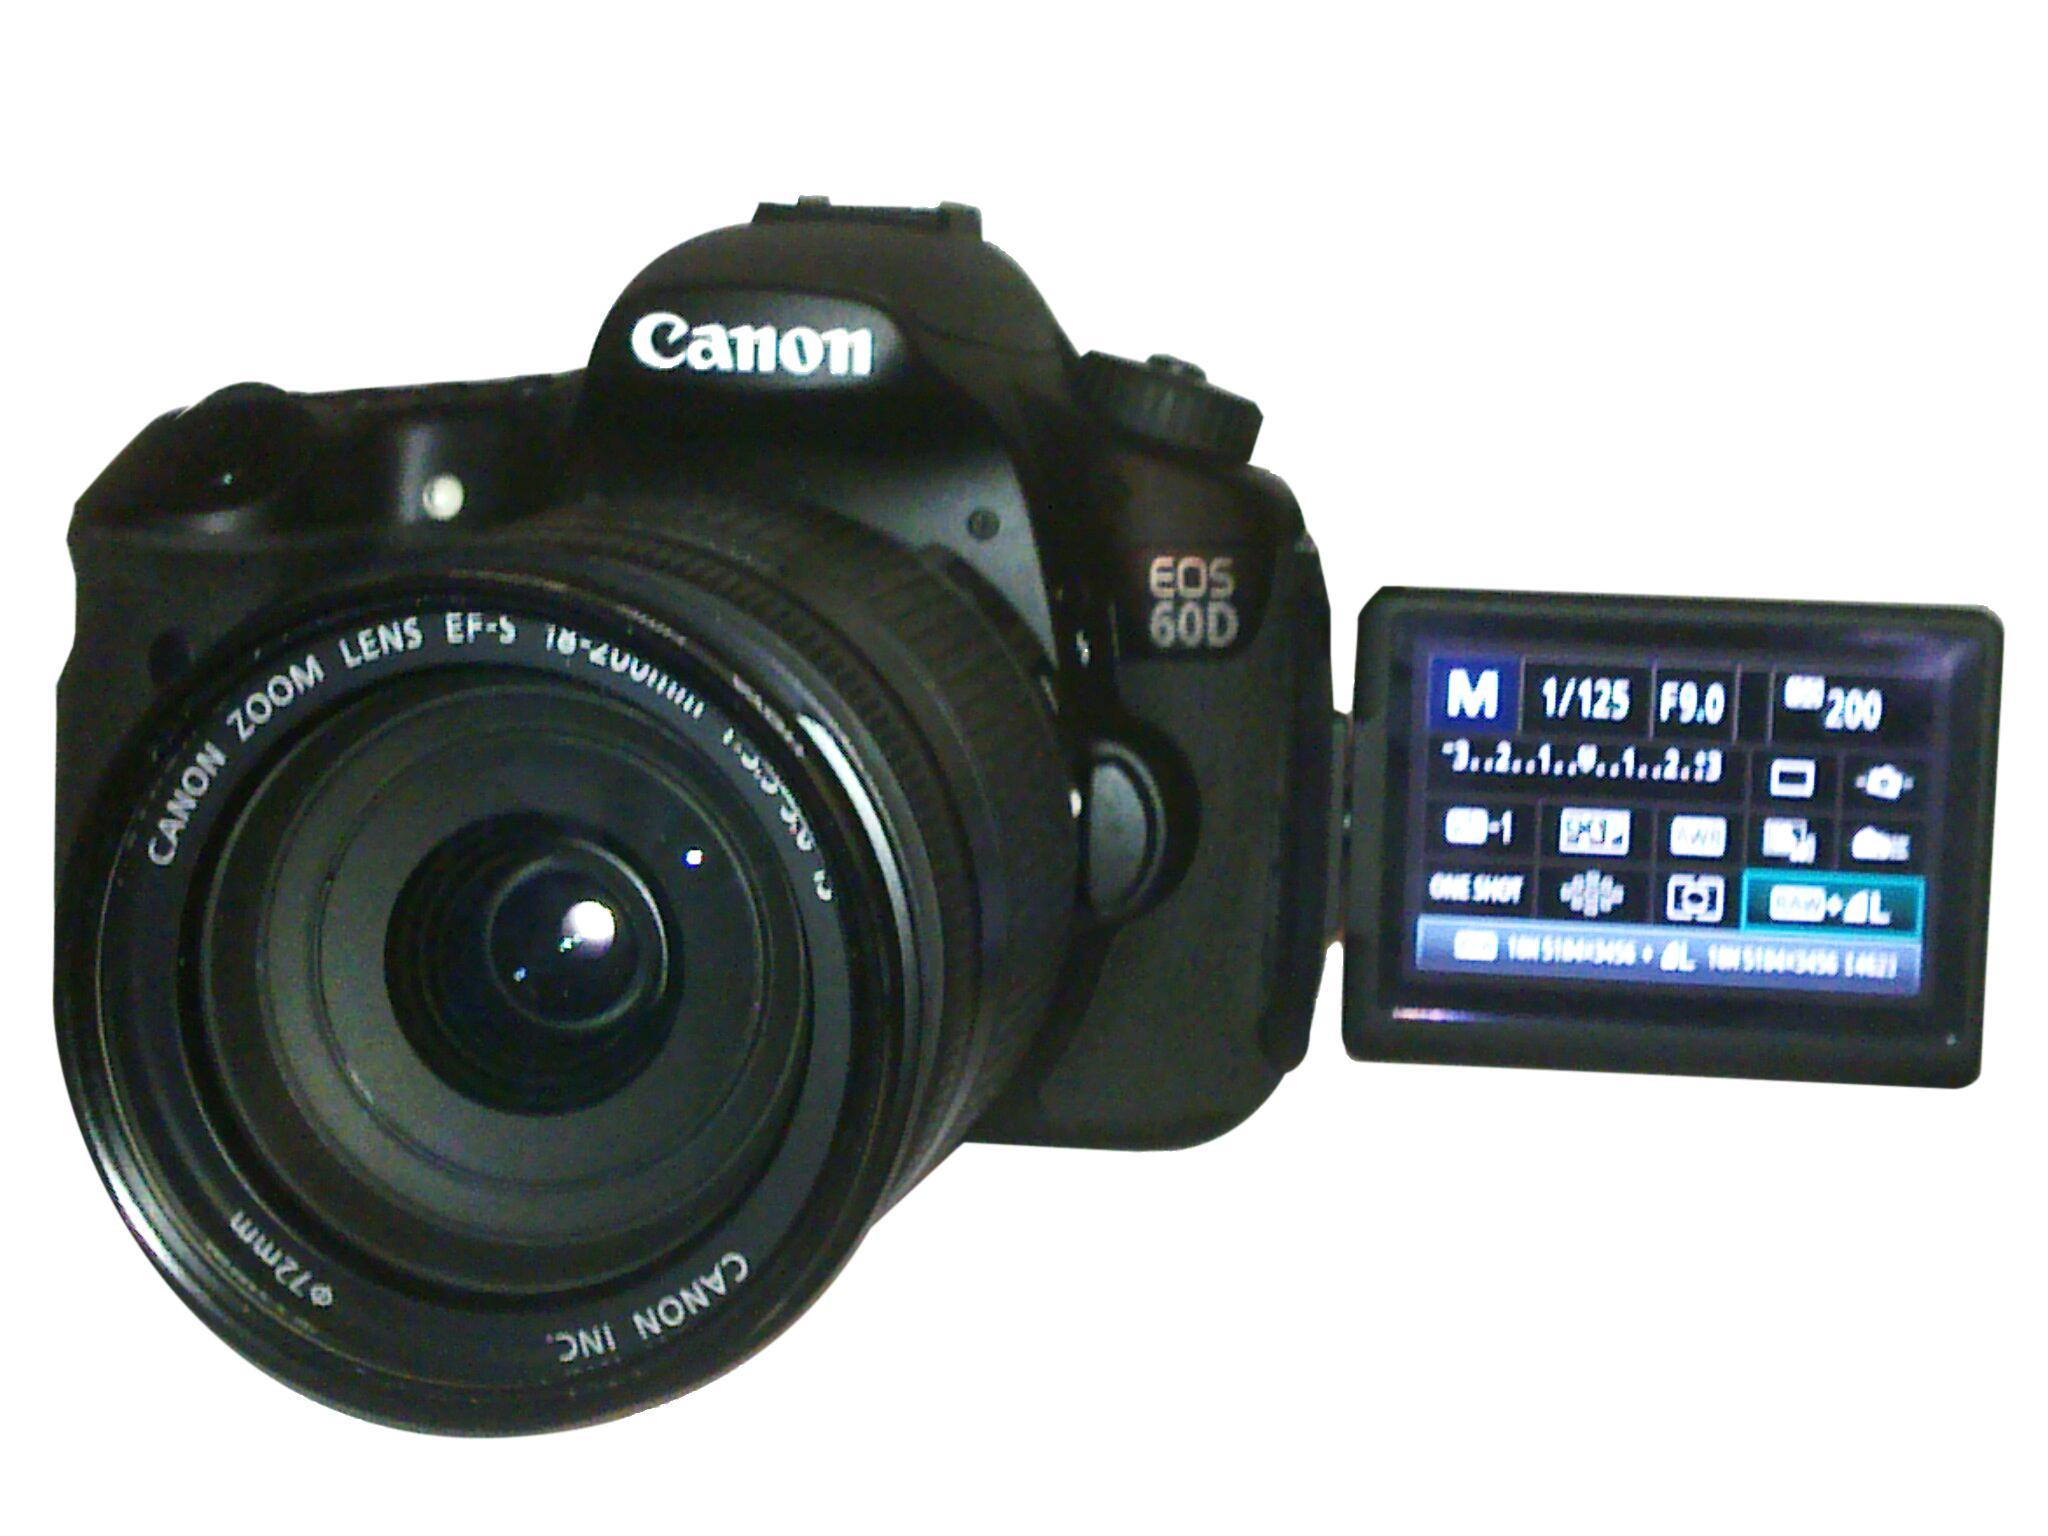 file camera canon eos 60d photo. Black Bedroom Furniture Sets. Home Design Ideas